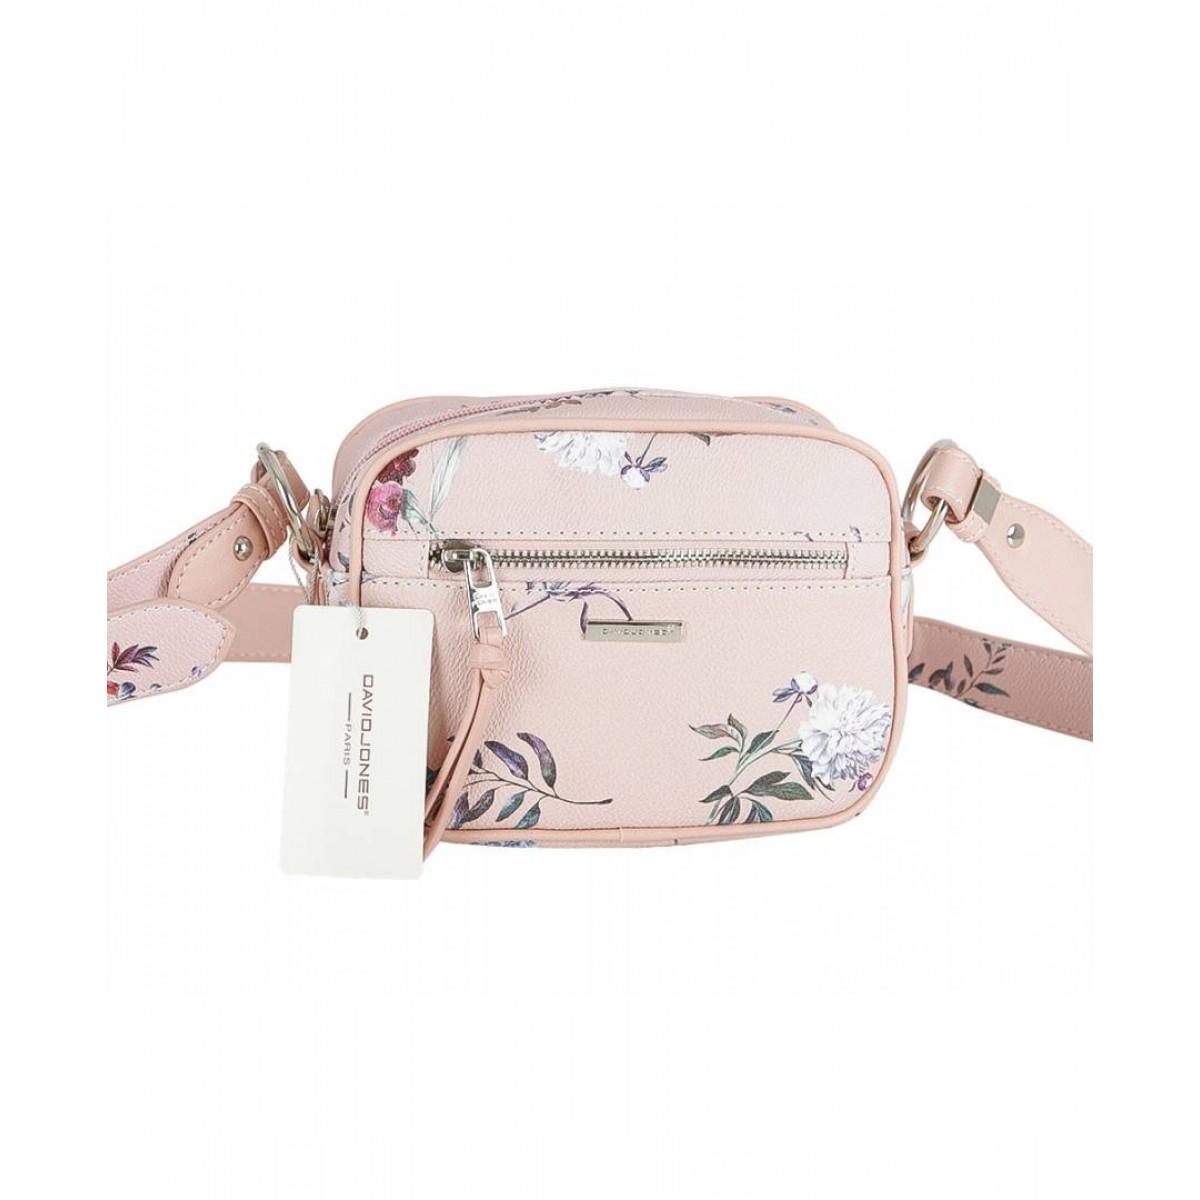 Жіноча сумка David Jones 5996-1 PINK